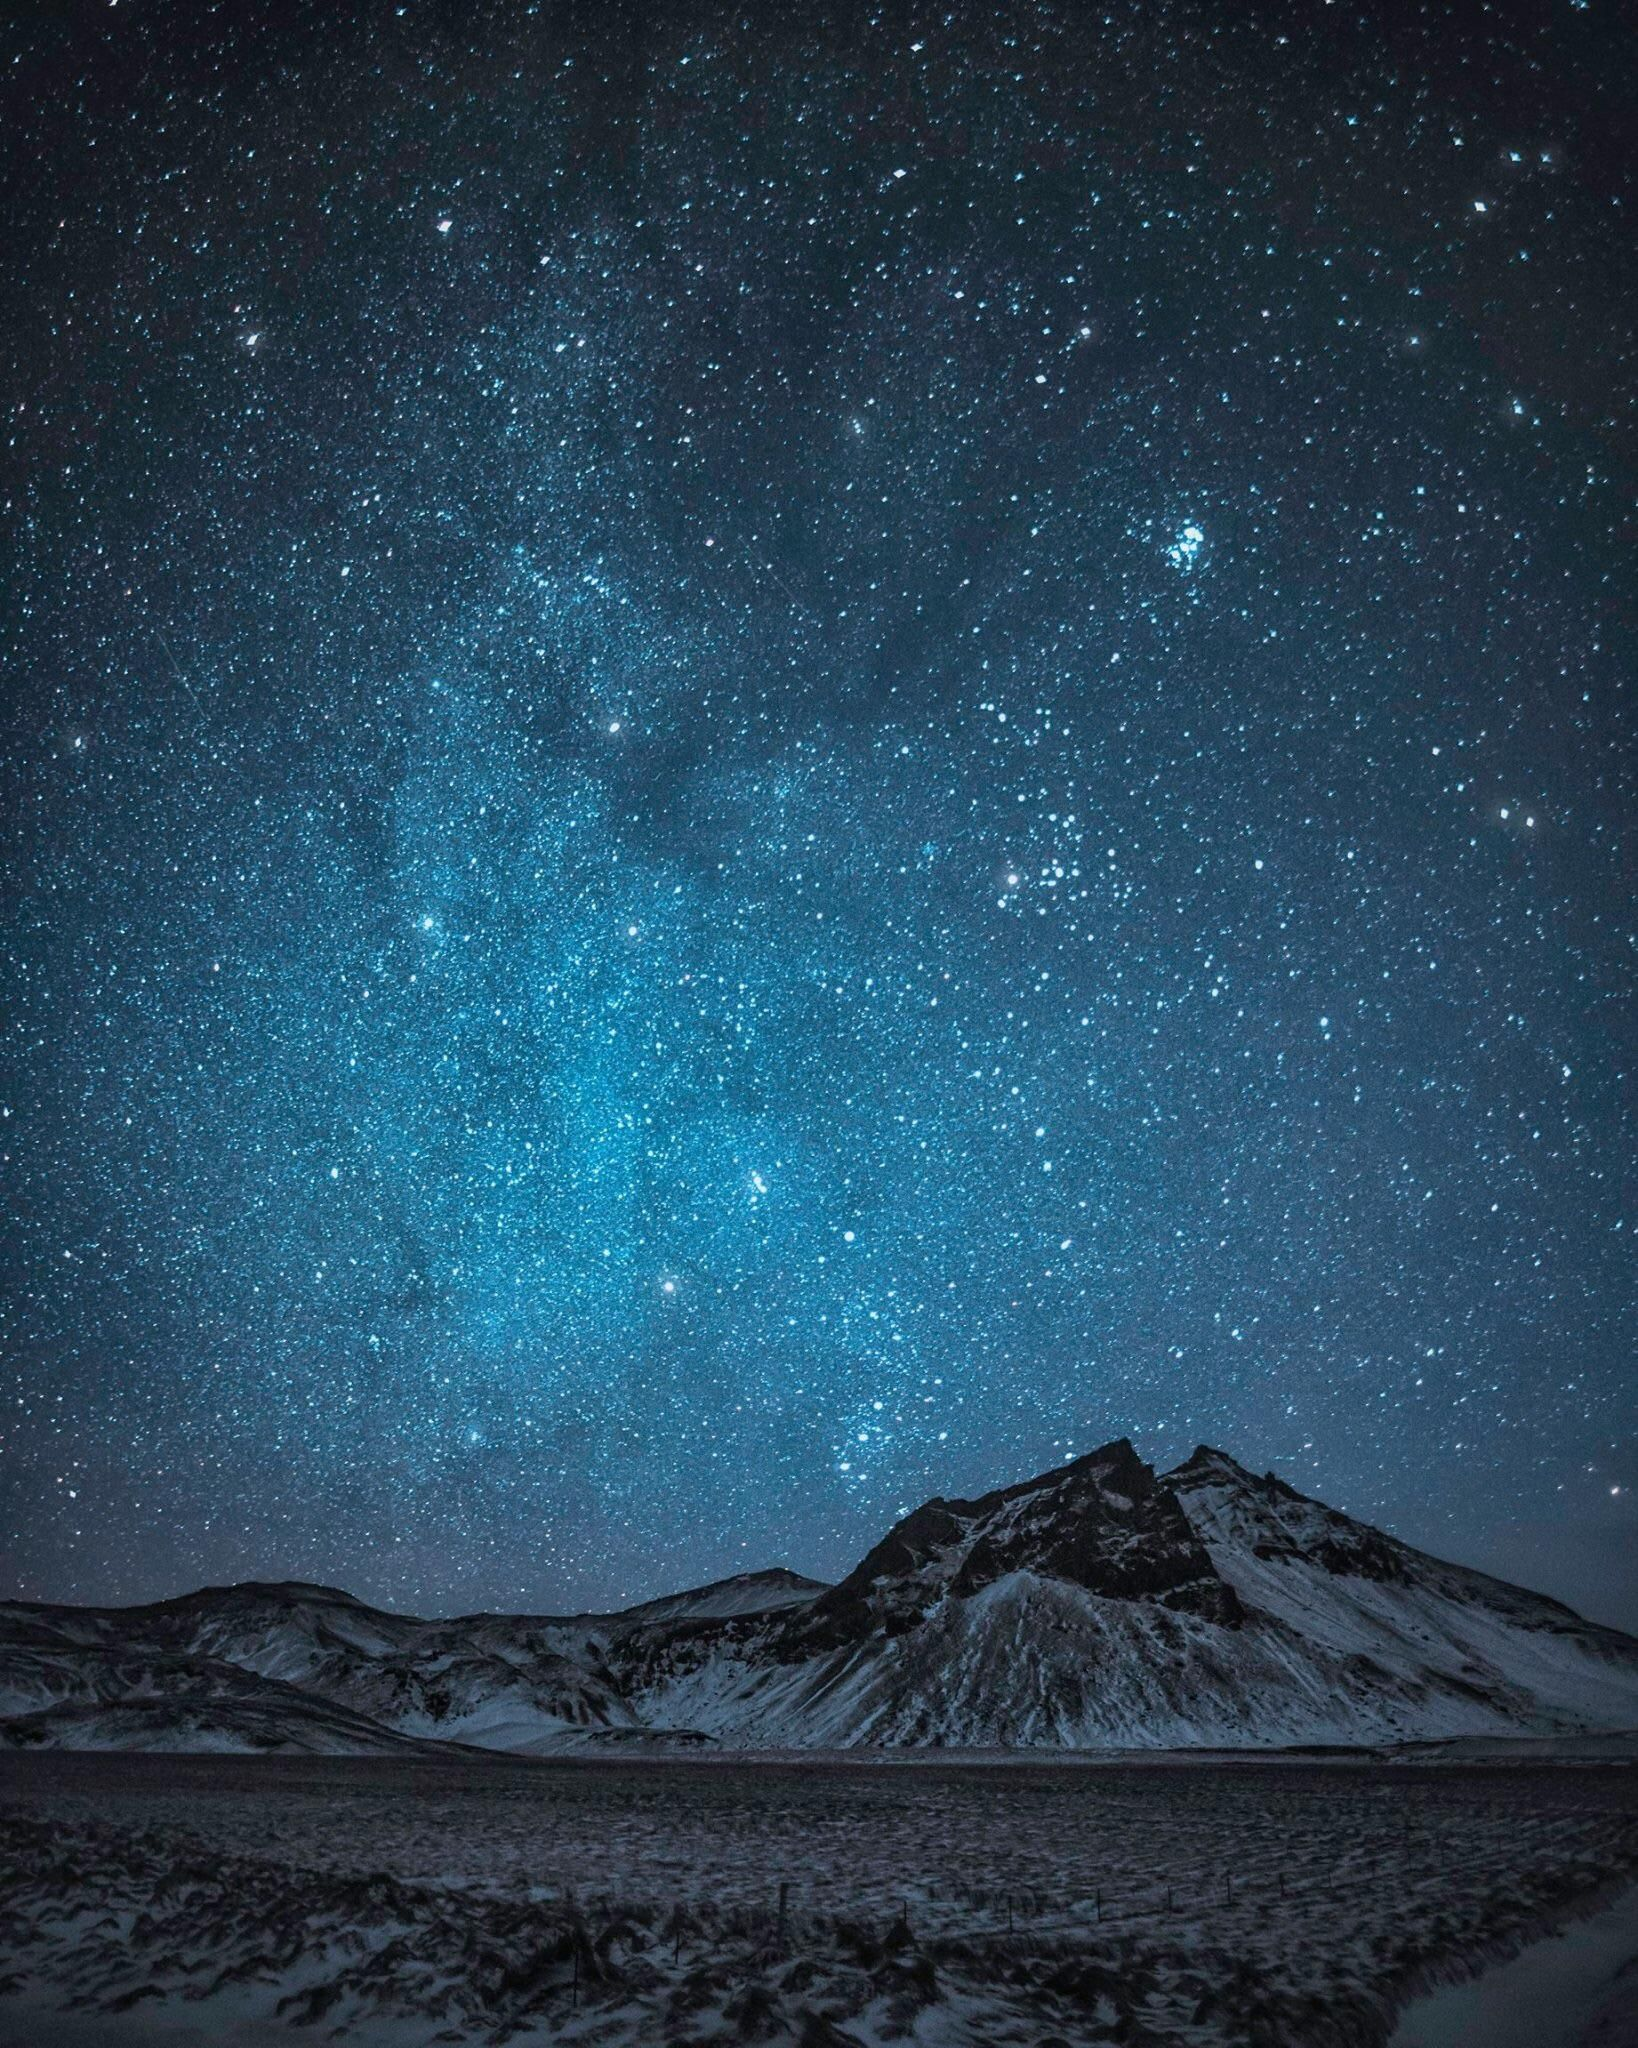 Starry Night Near Vik Iceland Oc 1638x2048 Https Ift Tt 2wkkoht Starry Night Black And White Landscape Night Photography